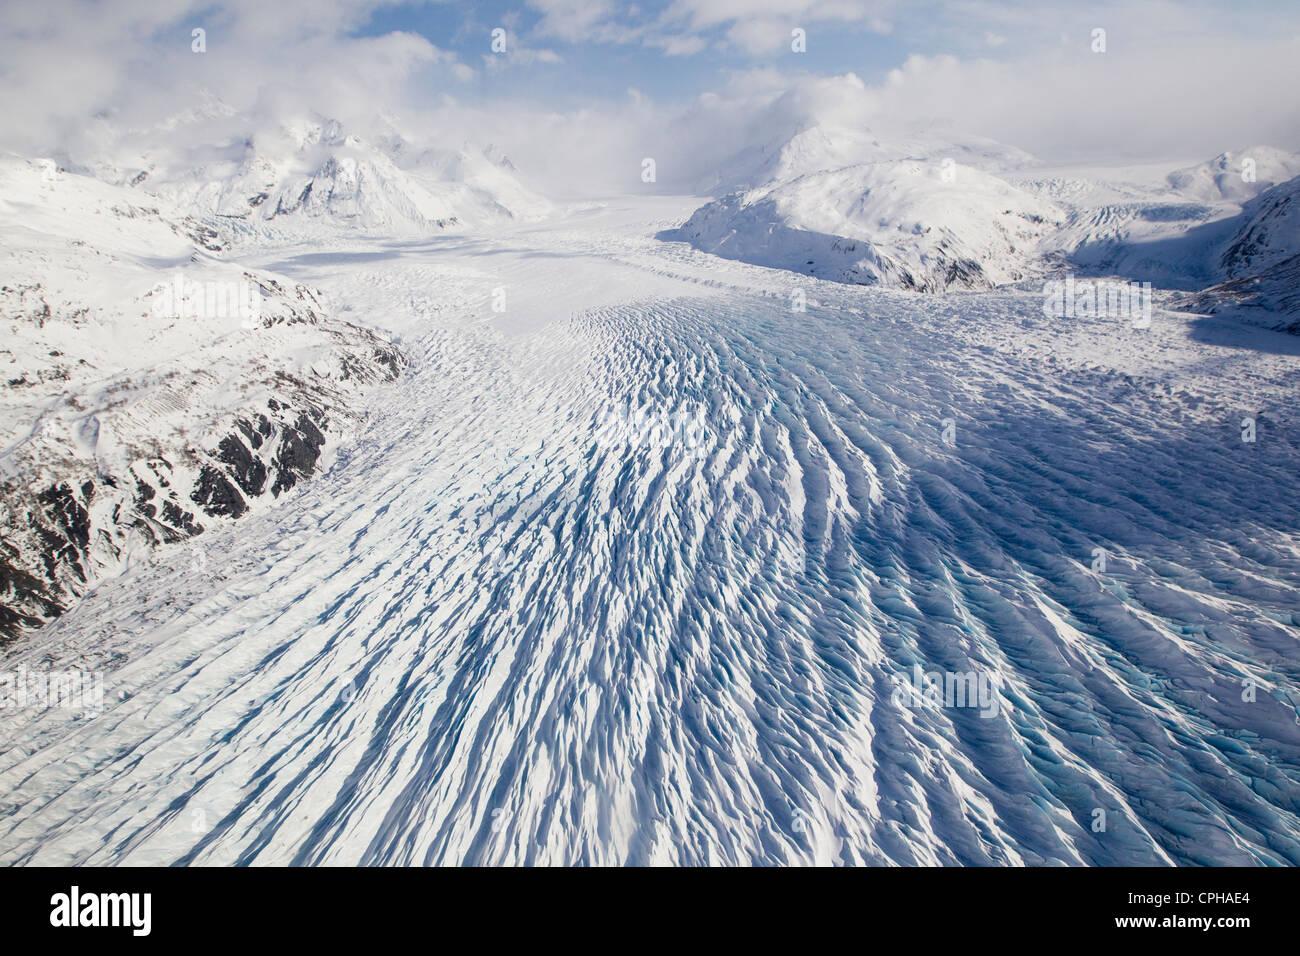 Knik Glacier, ice Chugach Mountains, Alaska - Stock Image